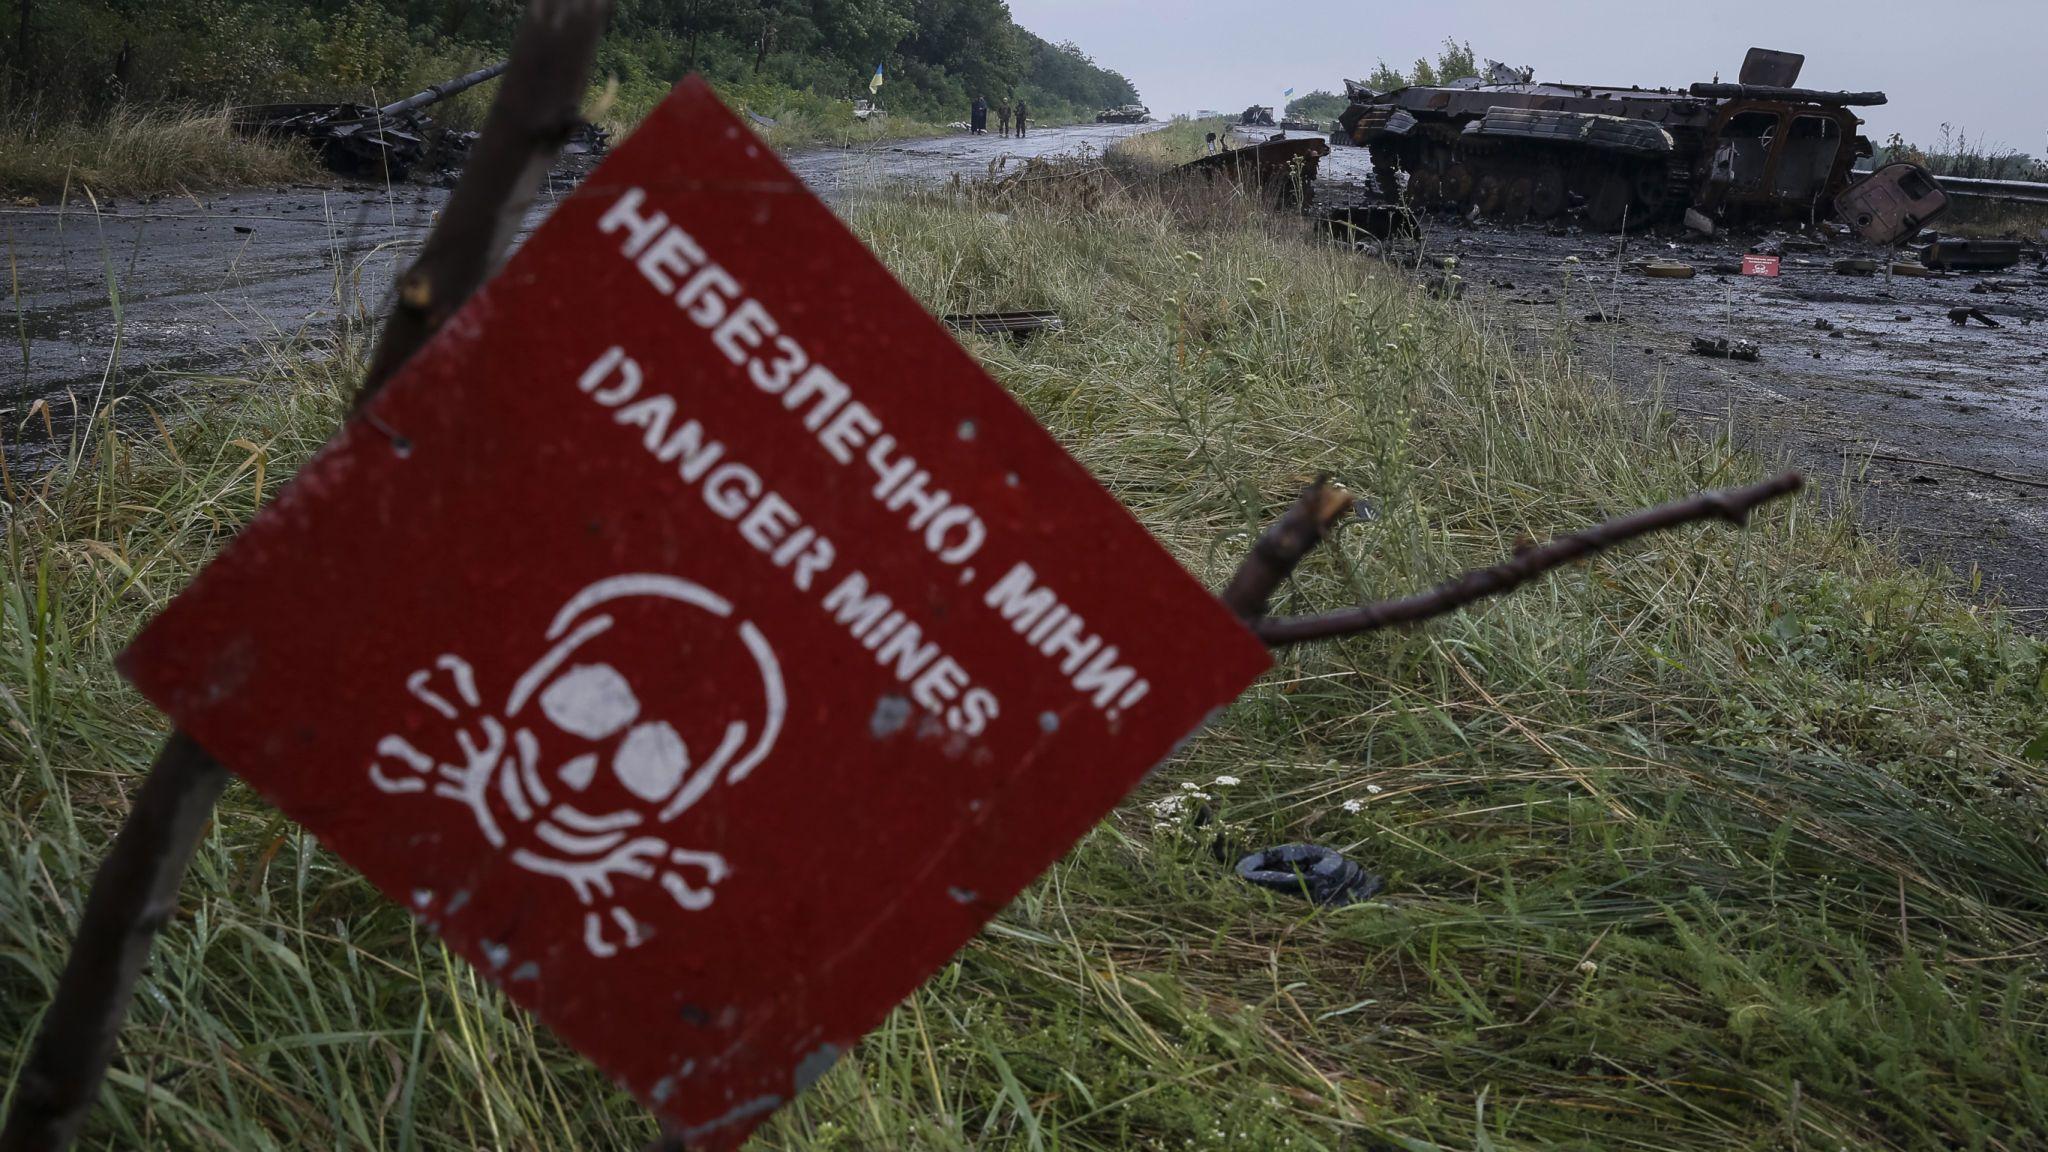 Landmine kills three boys playing in an 'abandoned house' in Ukraine